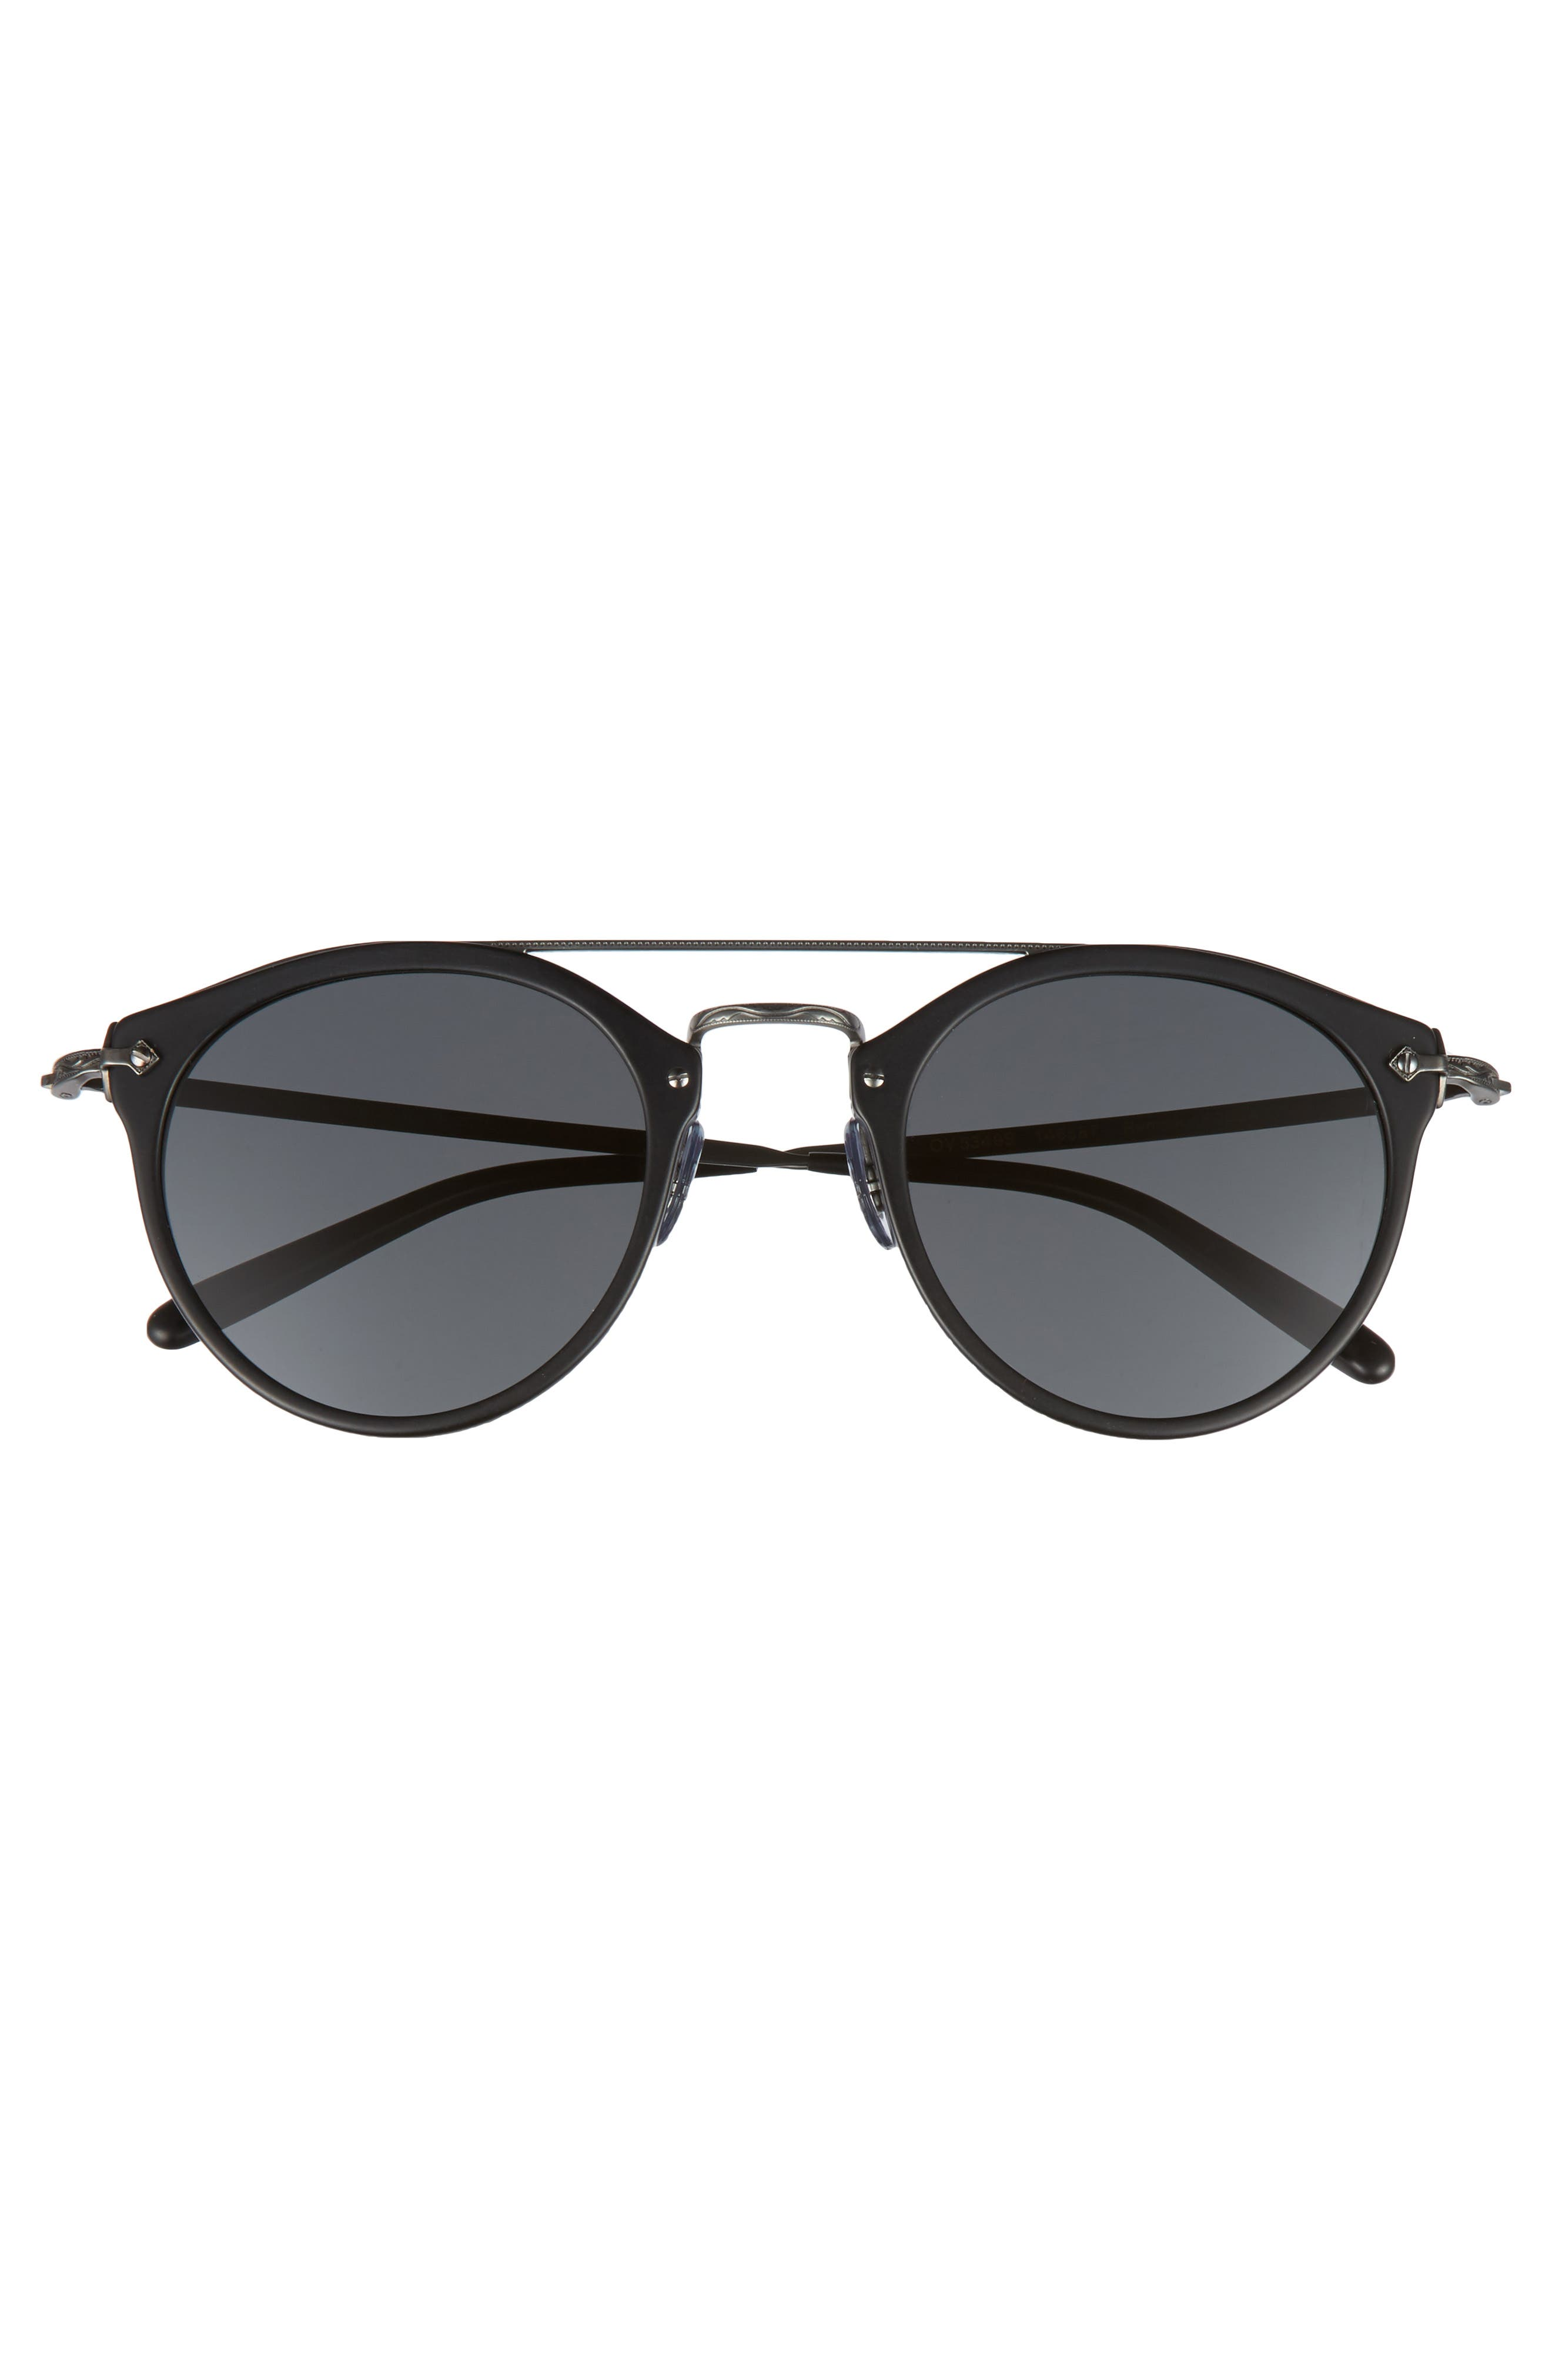 Remick 50mm Sunglasses,                             Alternate thumbnail 2, color,                             001